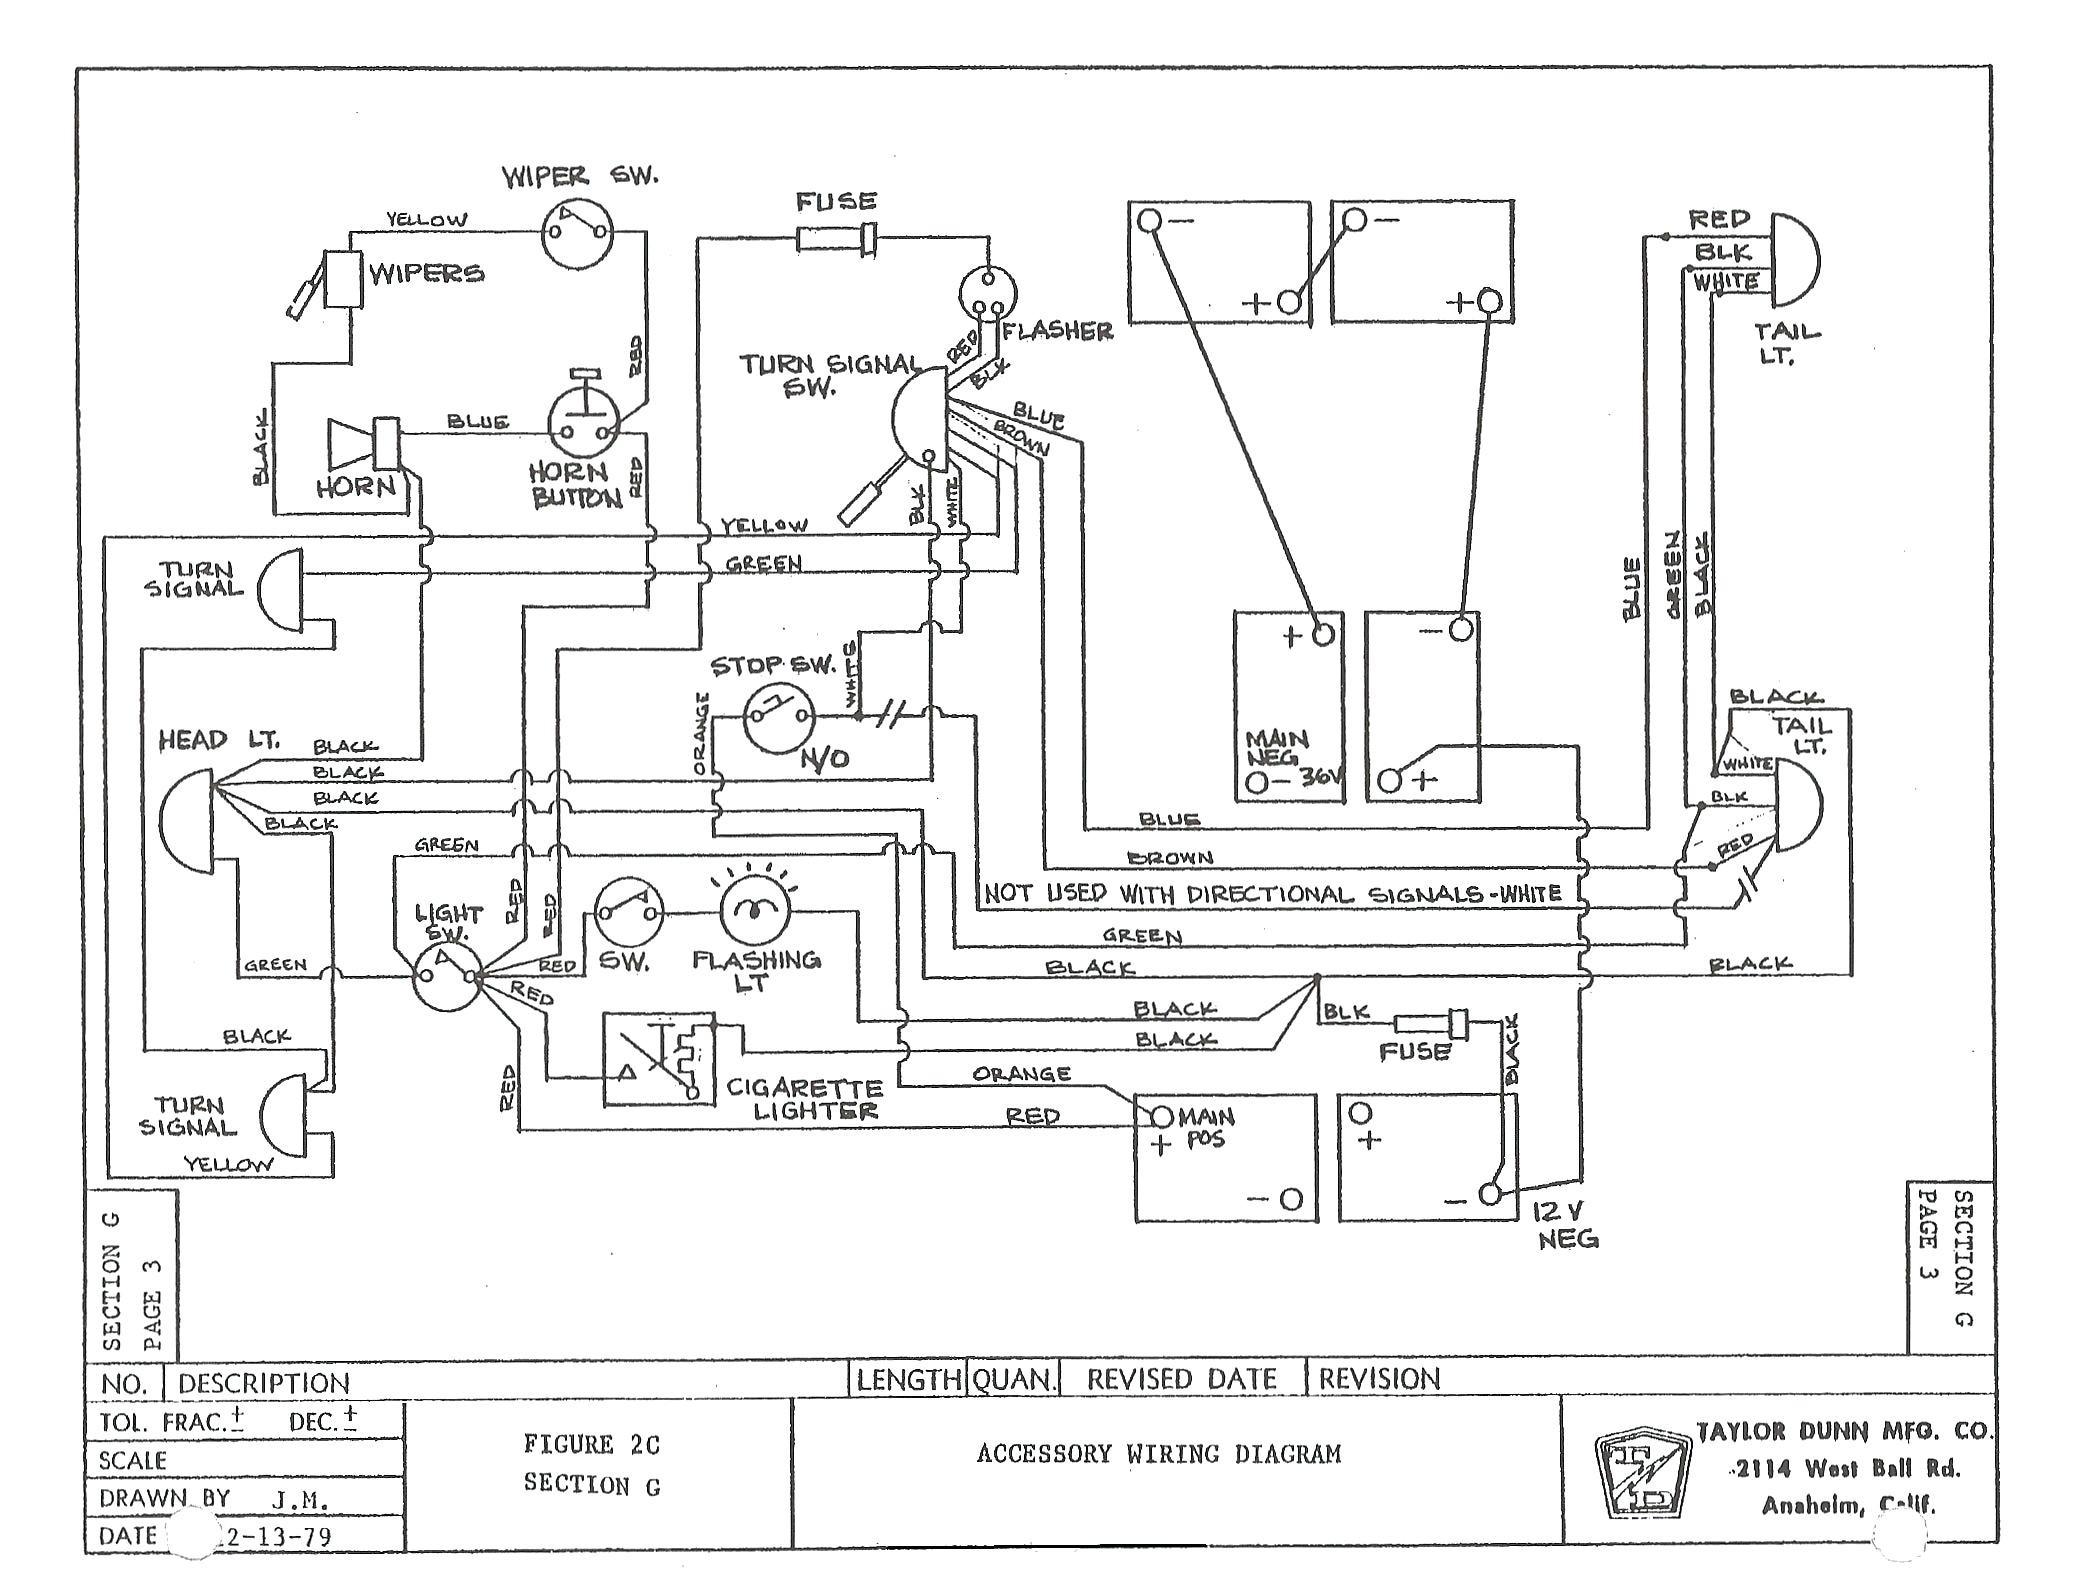 Ez Go Golf Cart Battery Wiring Diagram 98 Ez Go Wiring Diagram 1998 Electrical Floor Mount Dimmer Lights Of Ez Go Golf Cart Battery Wiring Diagram